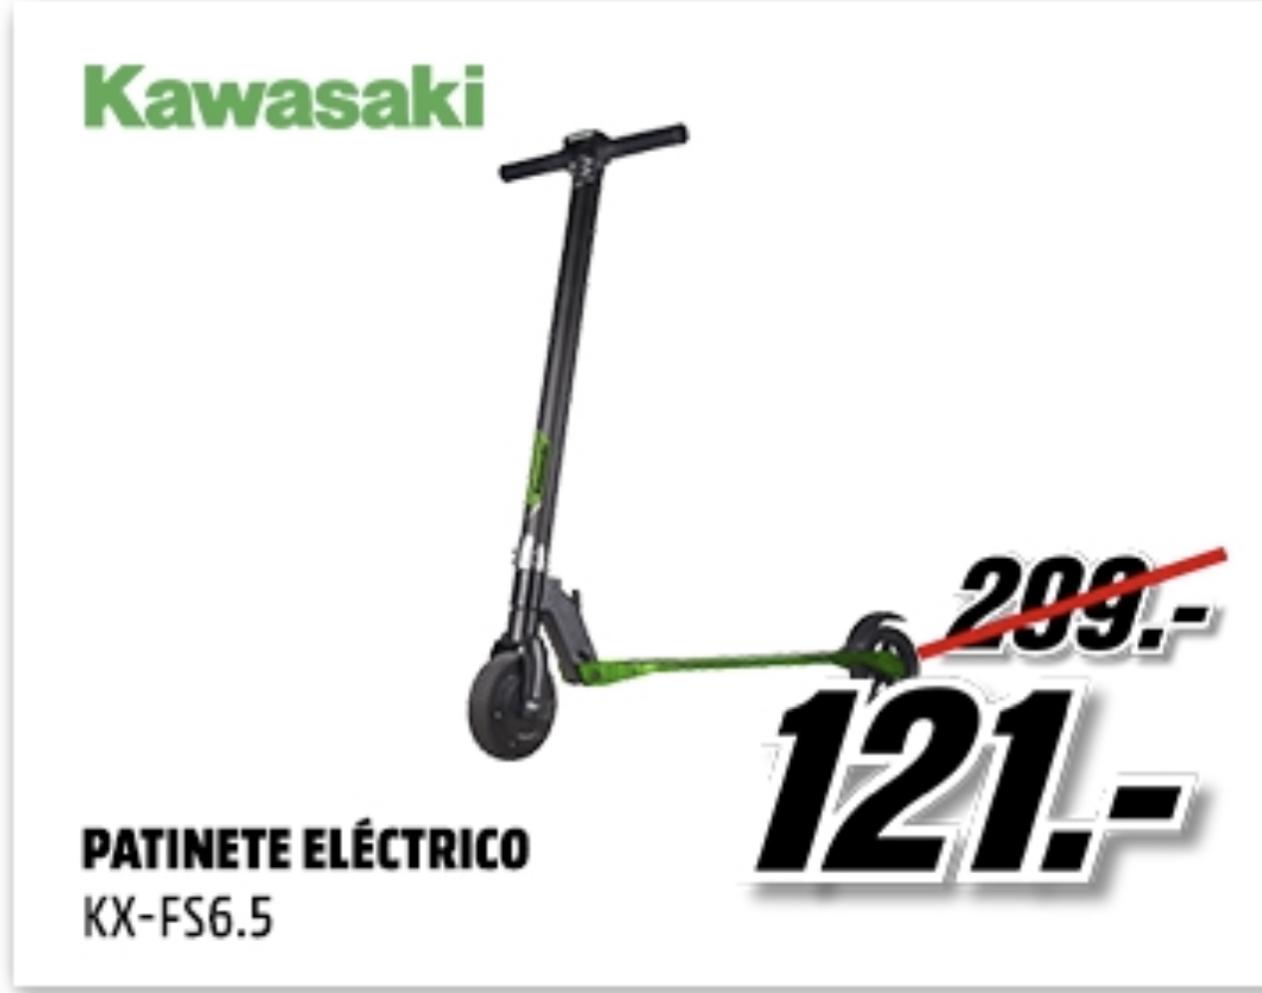 Patinete eléctrico - Kawasaki KX-FS6.5